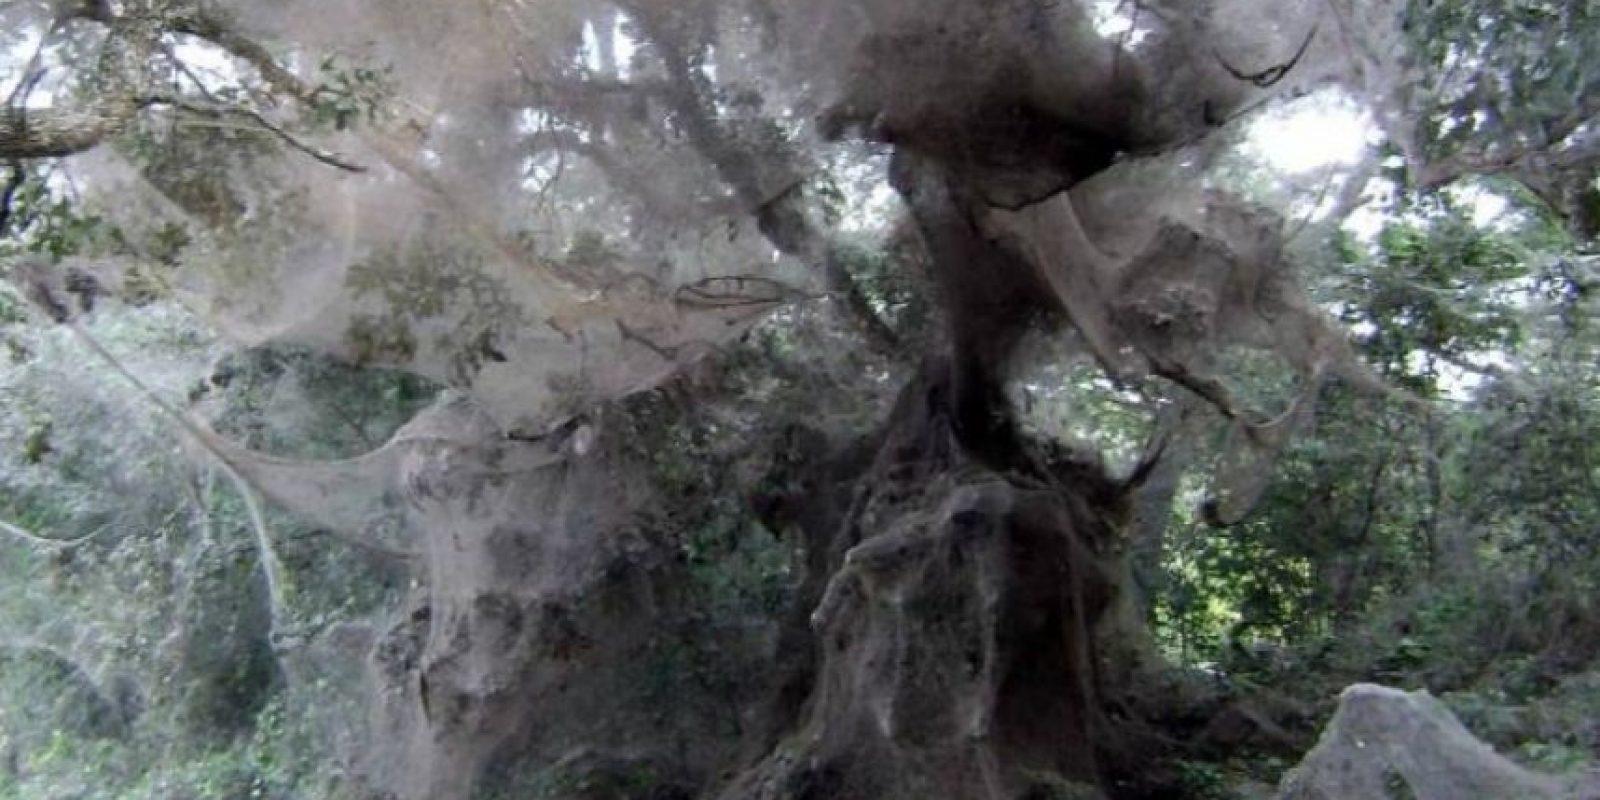 Así se observan los árboles cubiertos de telaraña. Foto: College of Agriculture and Life Sciences, Texas A&M AgriLife Extension Service